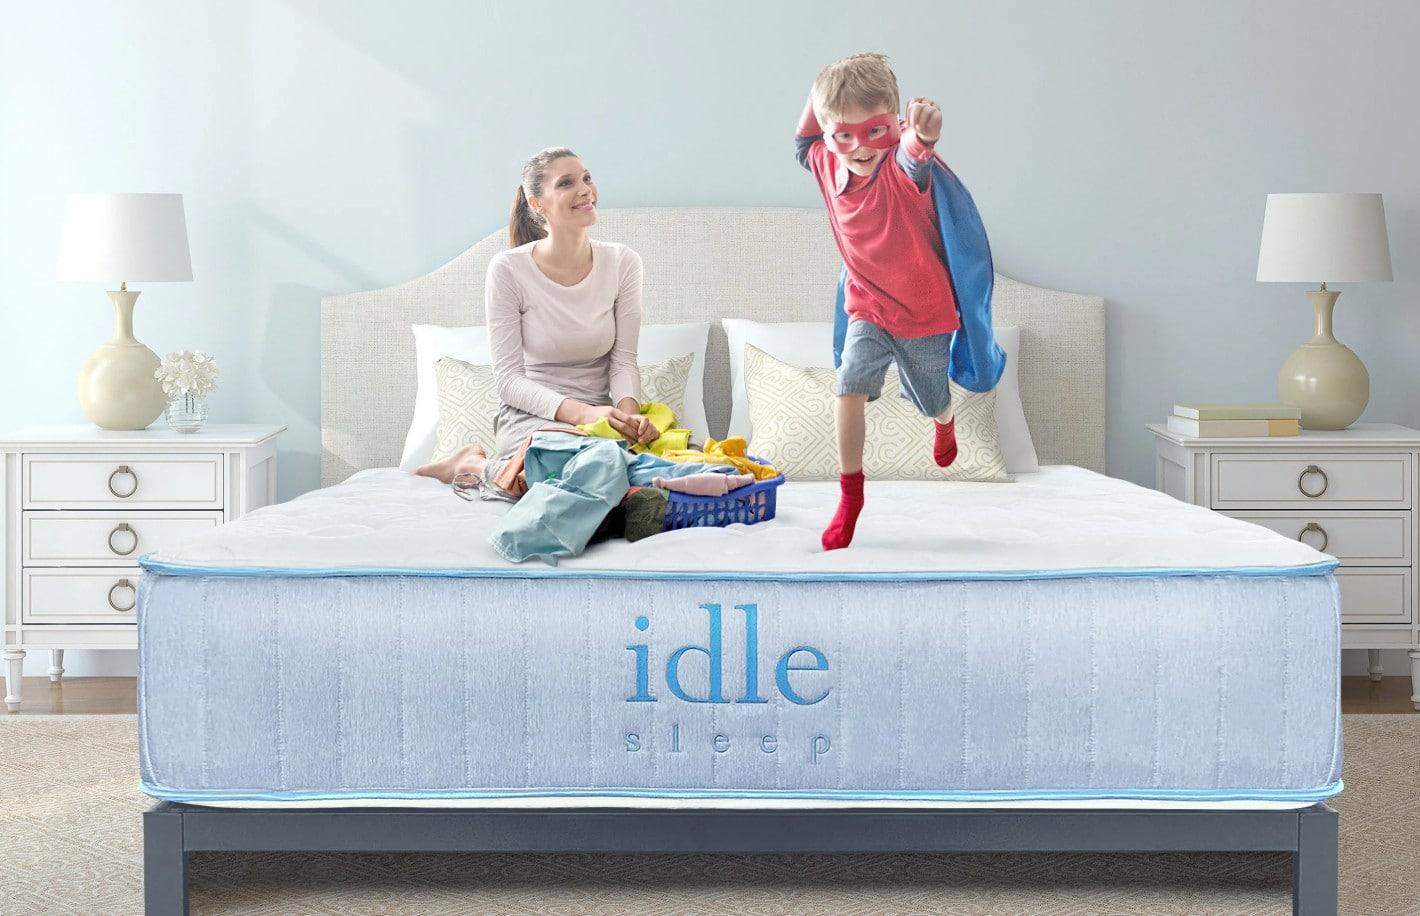 idle sleep hybrid mattress review